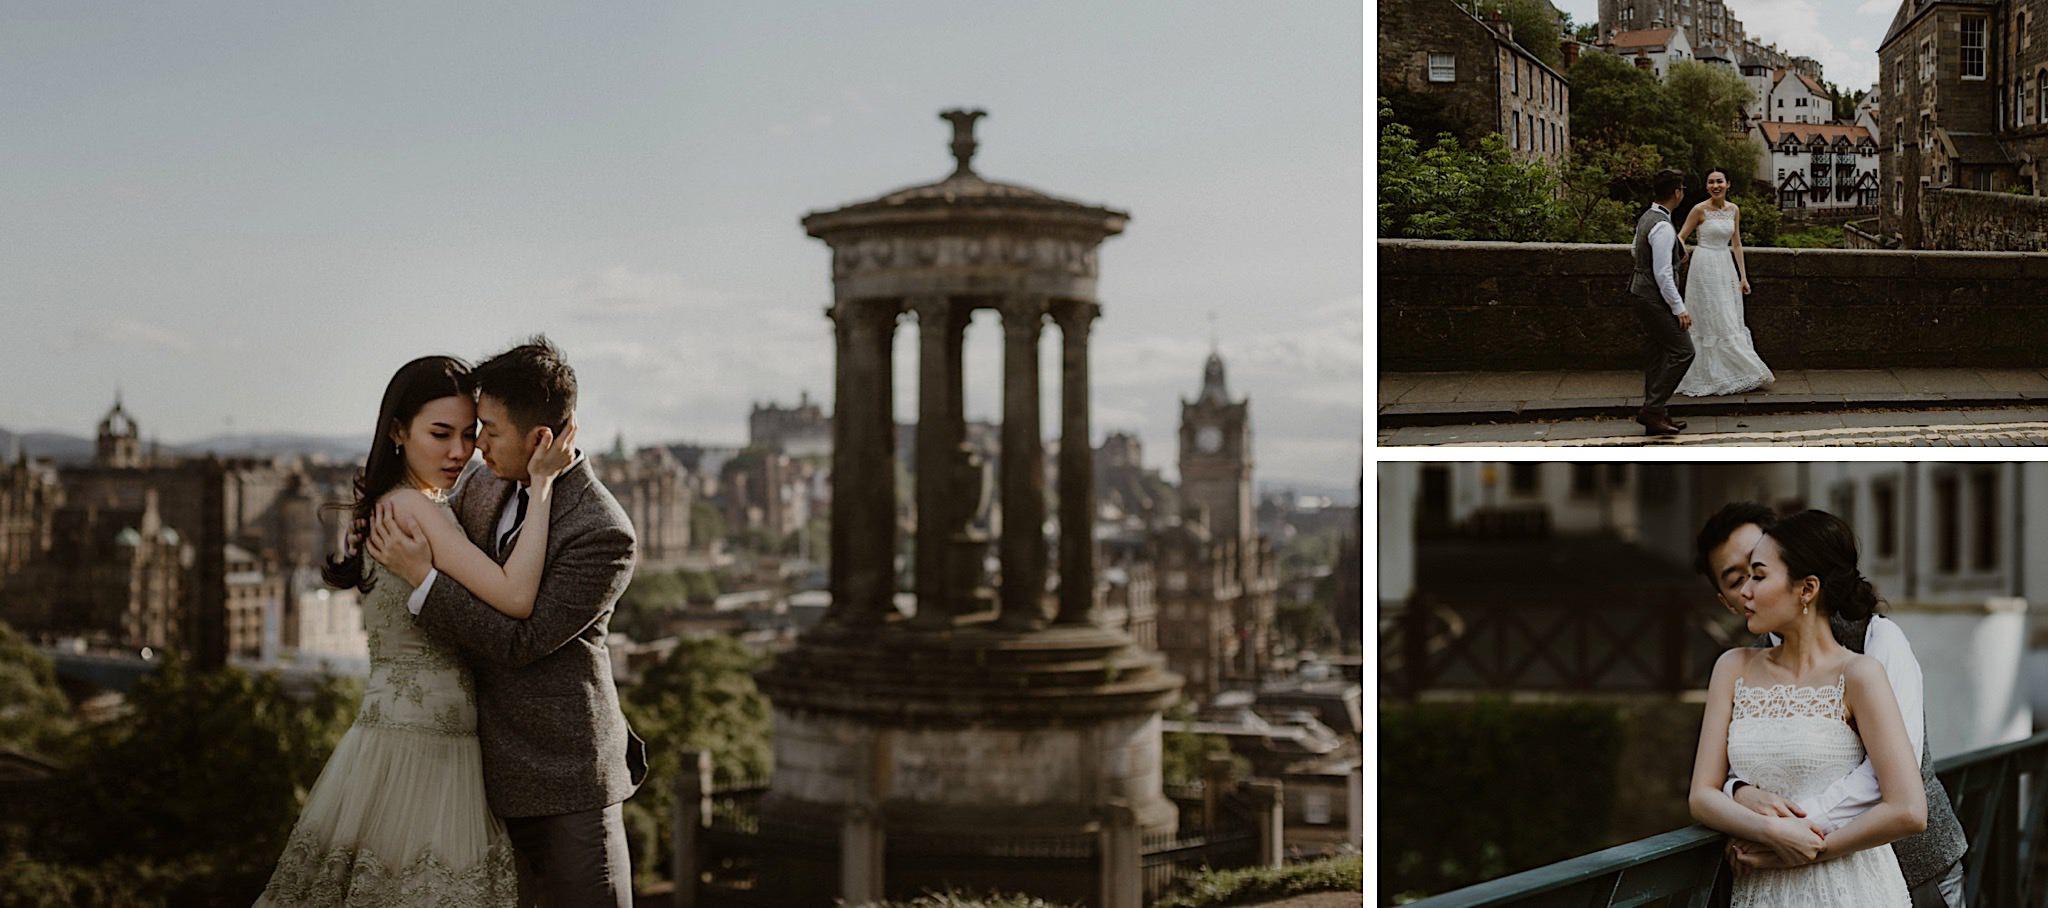 Scottish elopement couple exploring Edinburgh including Stockbridge and Carlton Hill